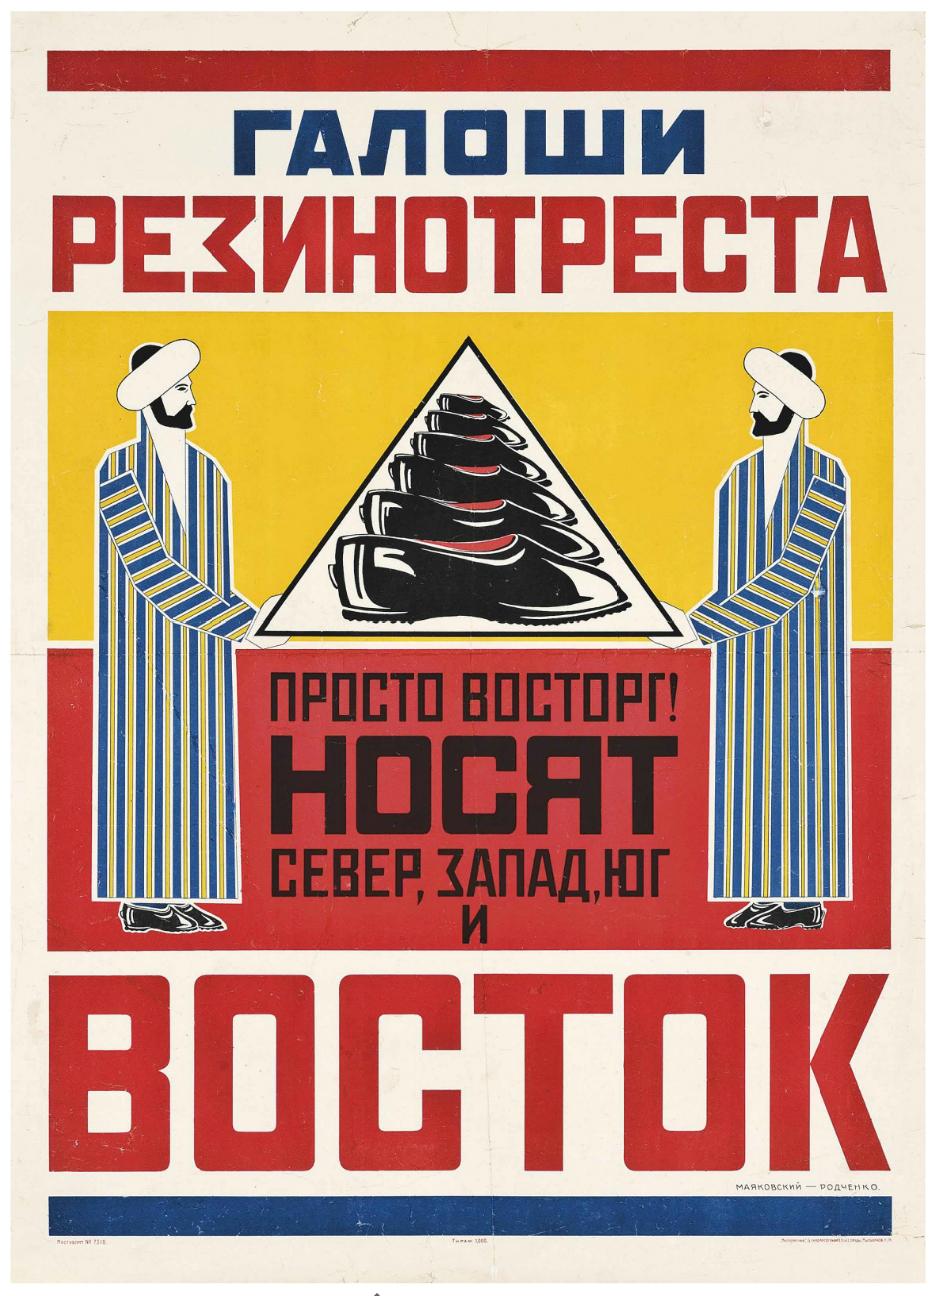 Плакаты -Alexander Rodchenko (1891-1956) & Vladimir Mayakovsky (1893-1930) литография 1923.jpg